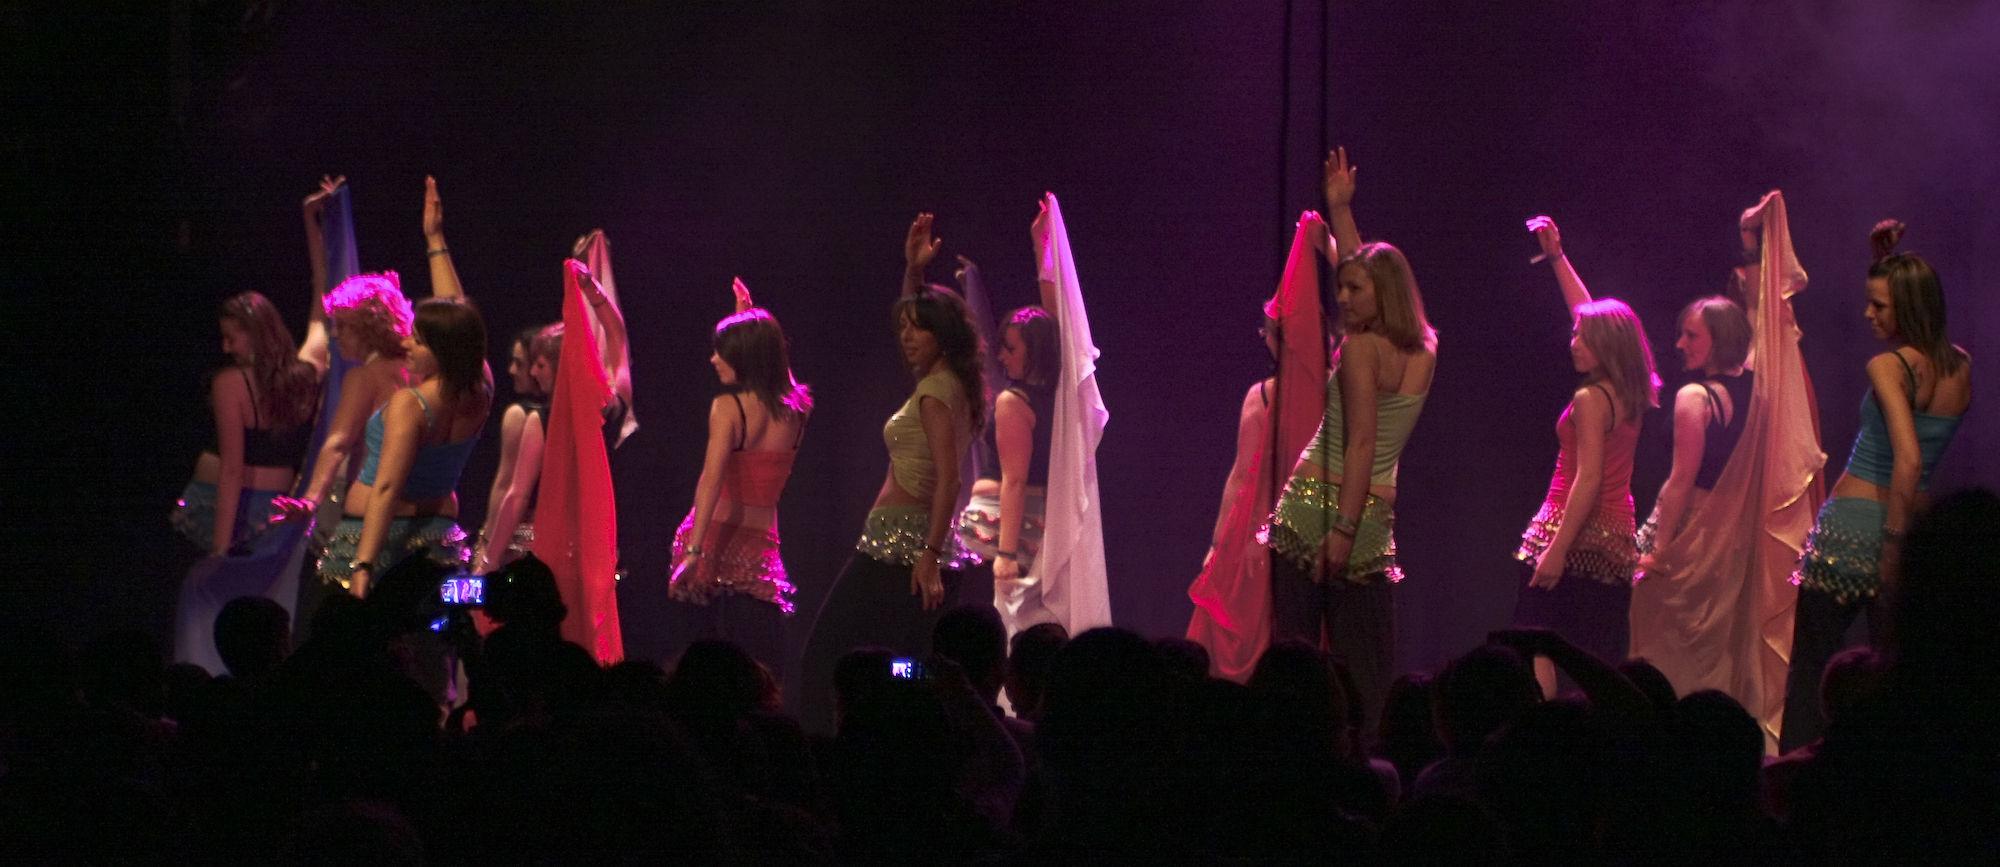 Atelier5-DanseOrientale-LeGrandMix-Quartiers2Lune2009-166